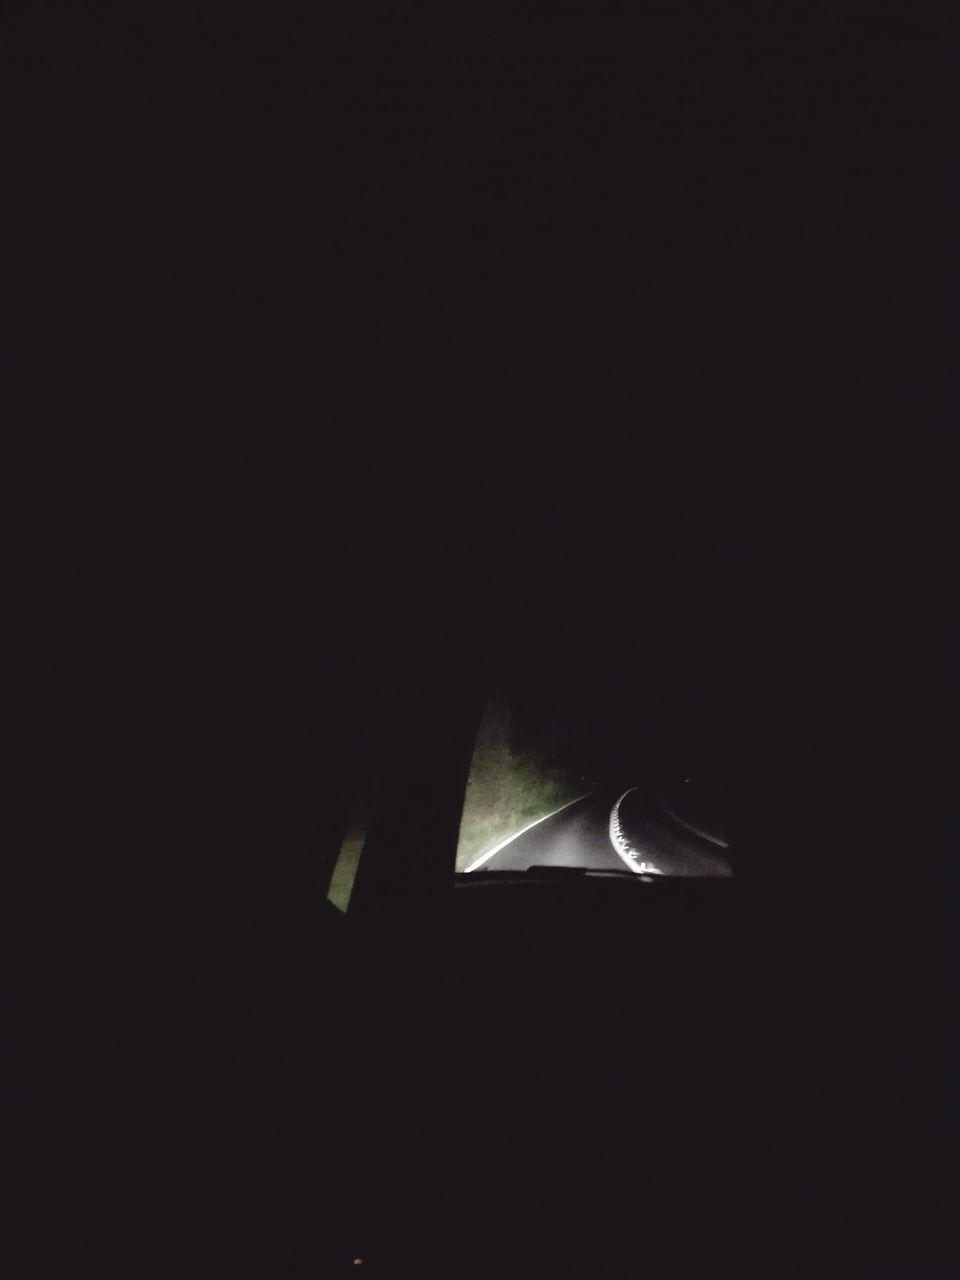 studio shot, copy space, black background, night, close-up, no people, illuminated, solar eclipse, indoors, astronomy, eyeball